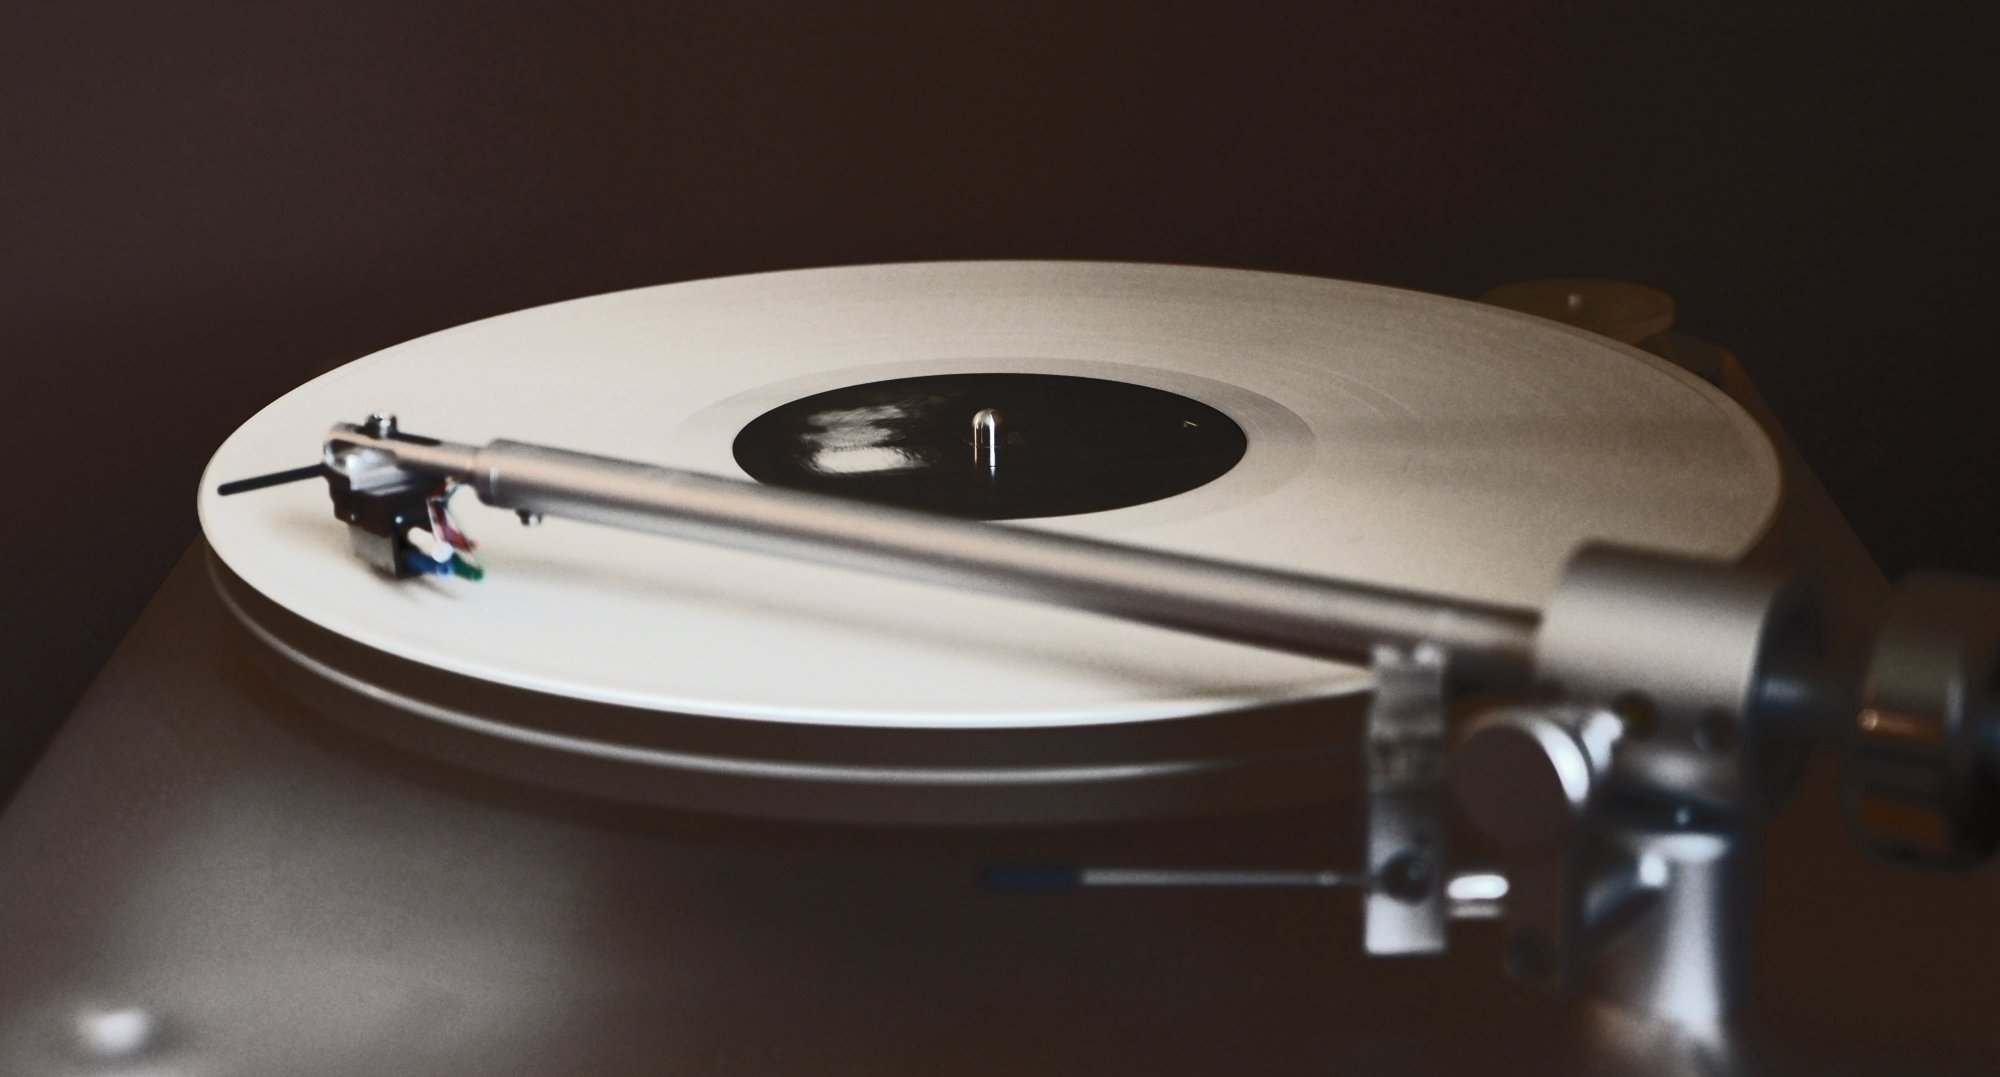 Kauan_Sorni_Nai_White_Ltd_Ed_Vinyl.thumb.jpg.c12119c6b888e3e609078b392c32f458.jpg